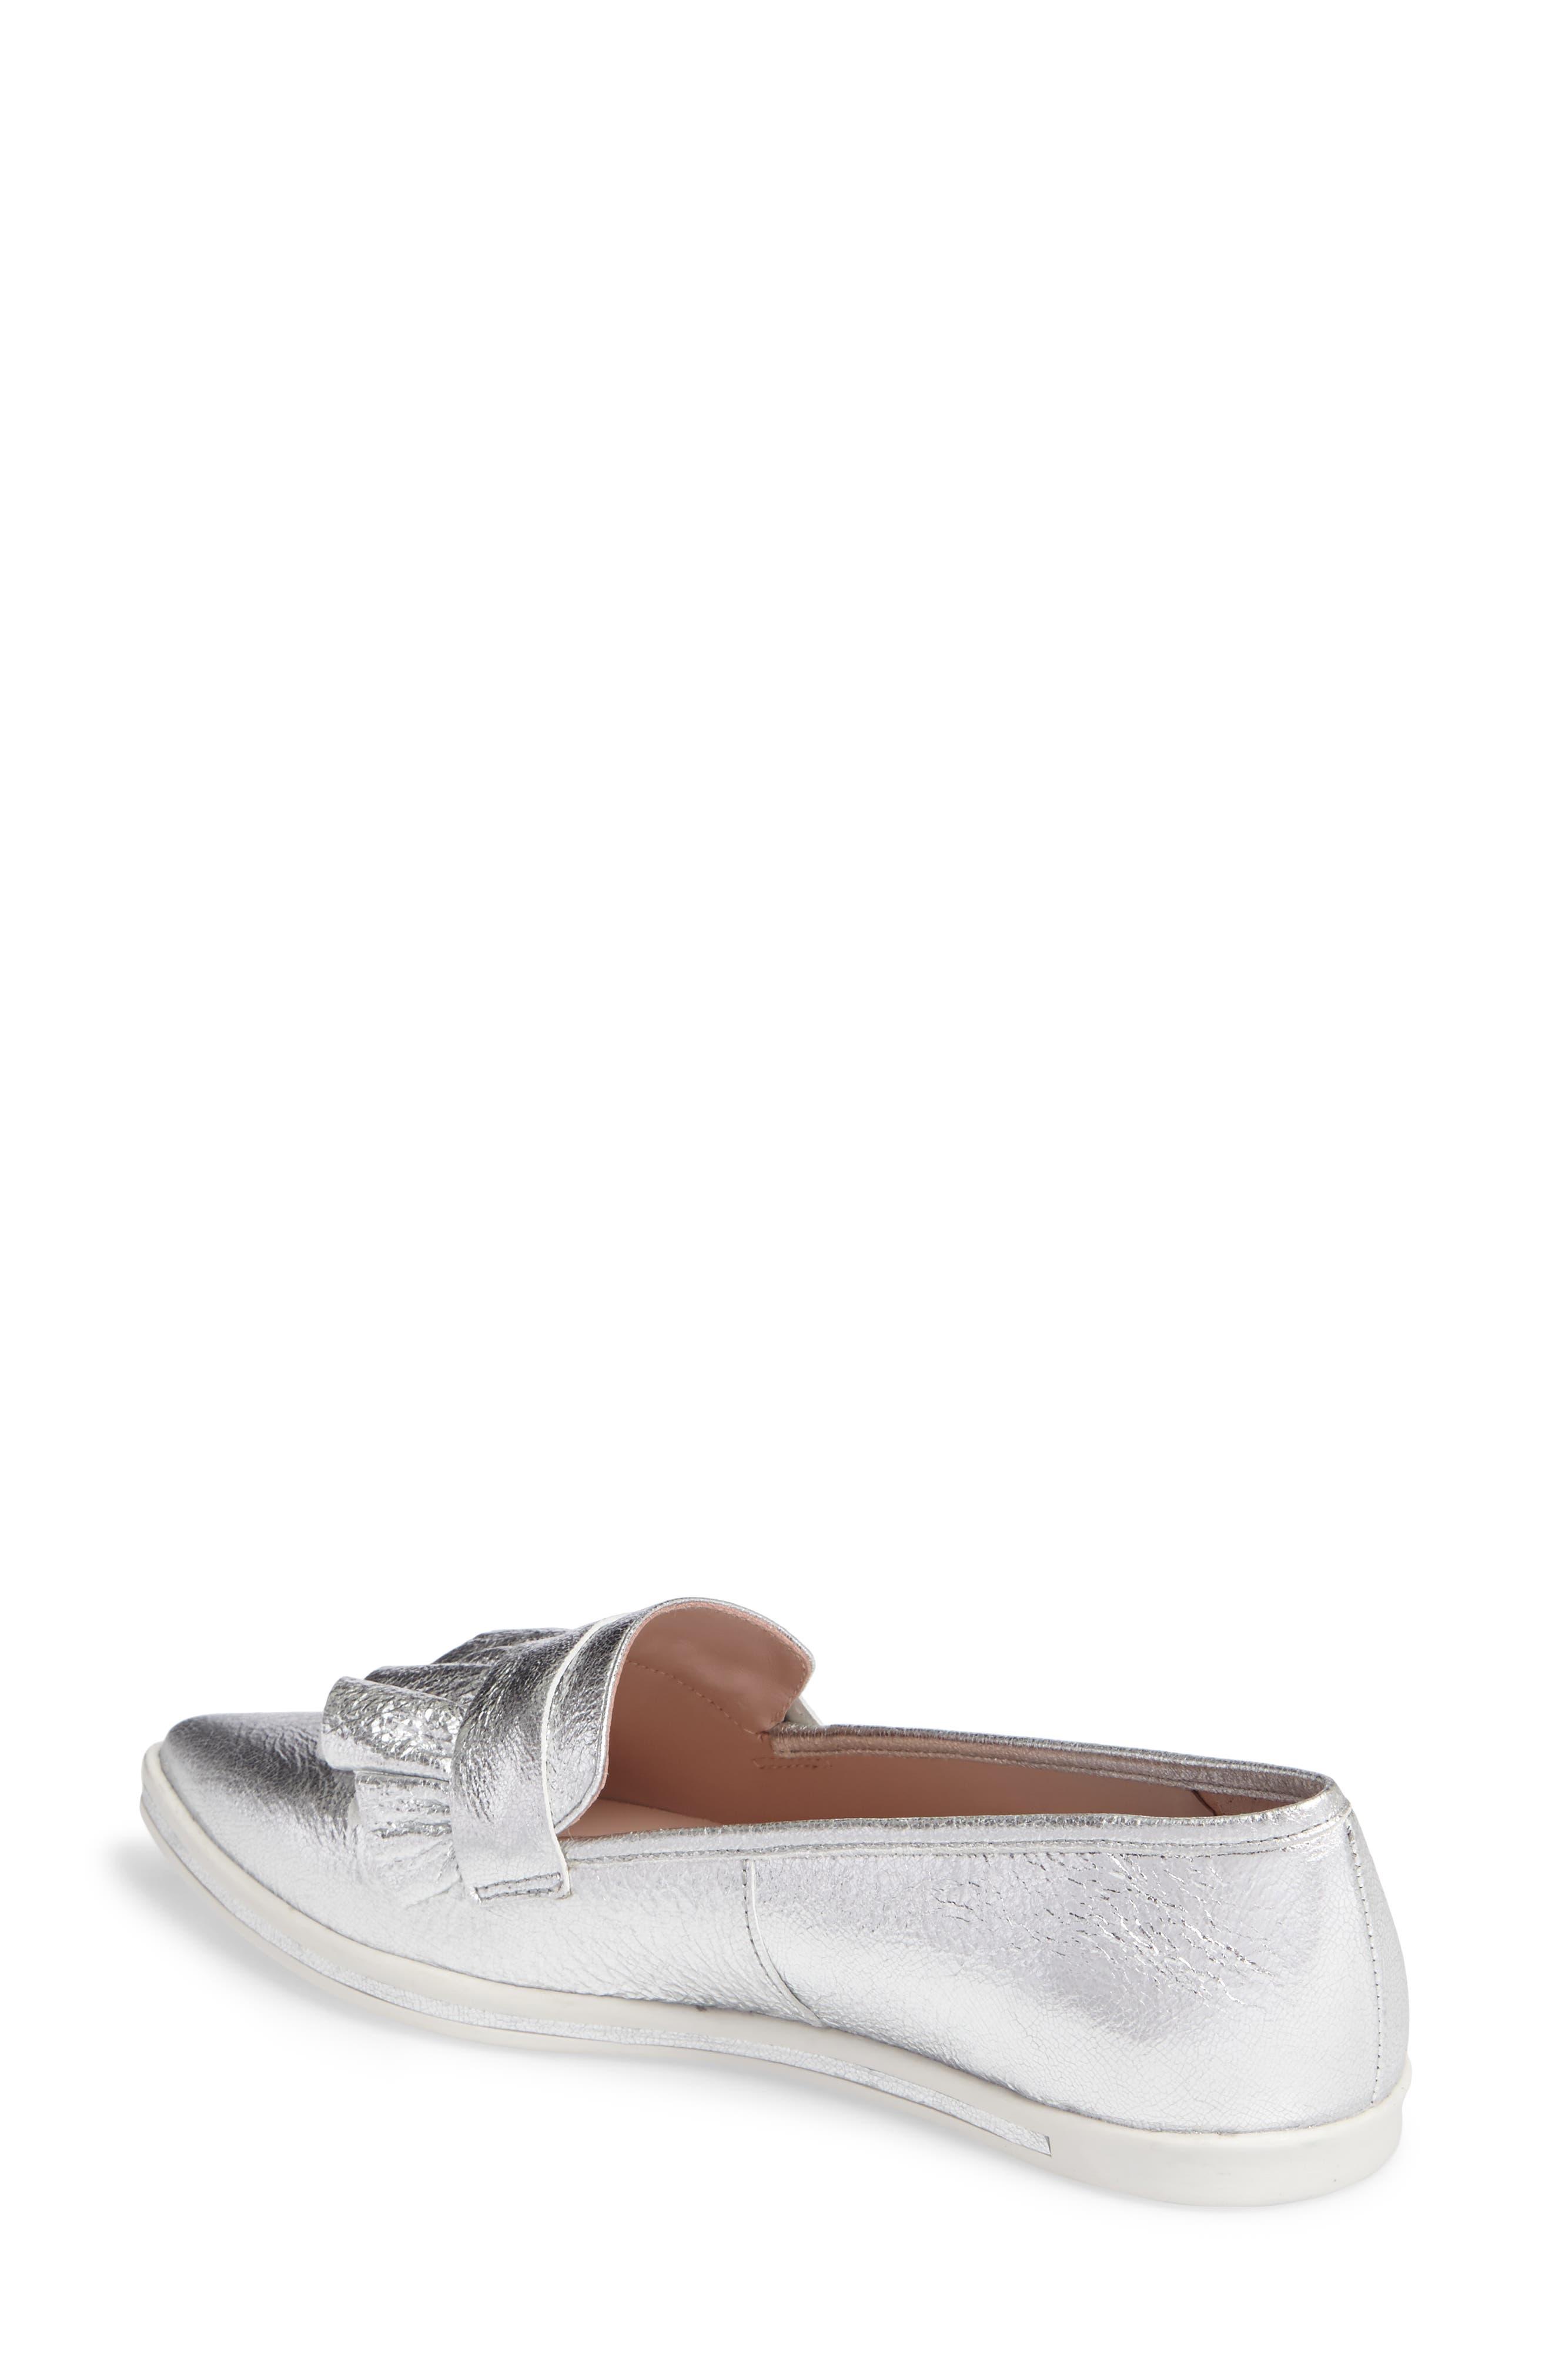 Taraji Ruffle Slip-On Sneaker,                             Alternate thumbnail 6, color,